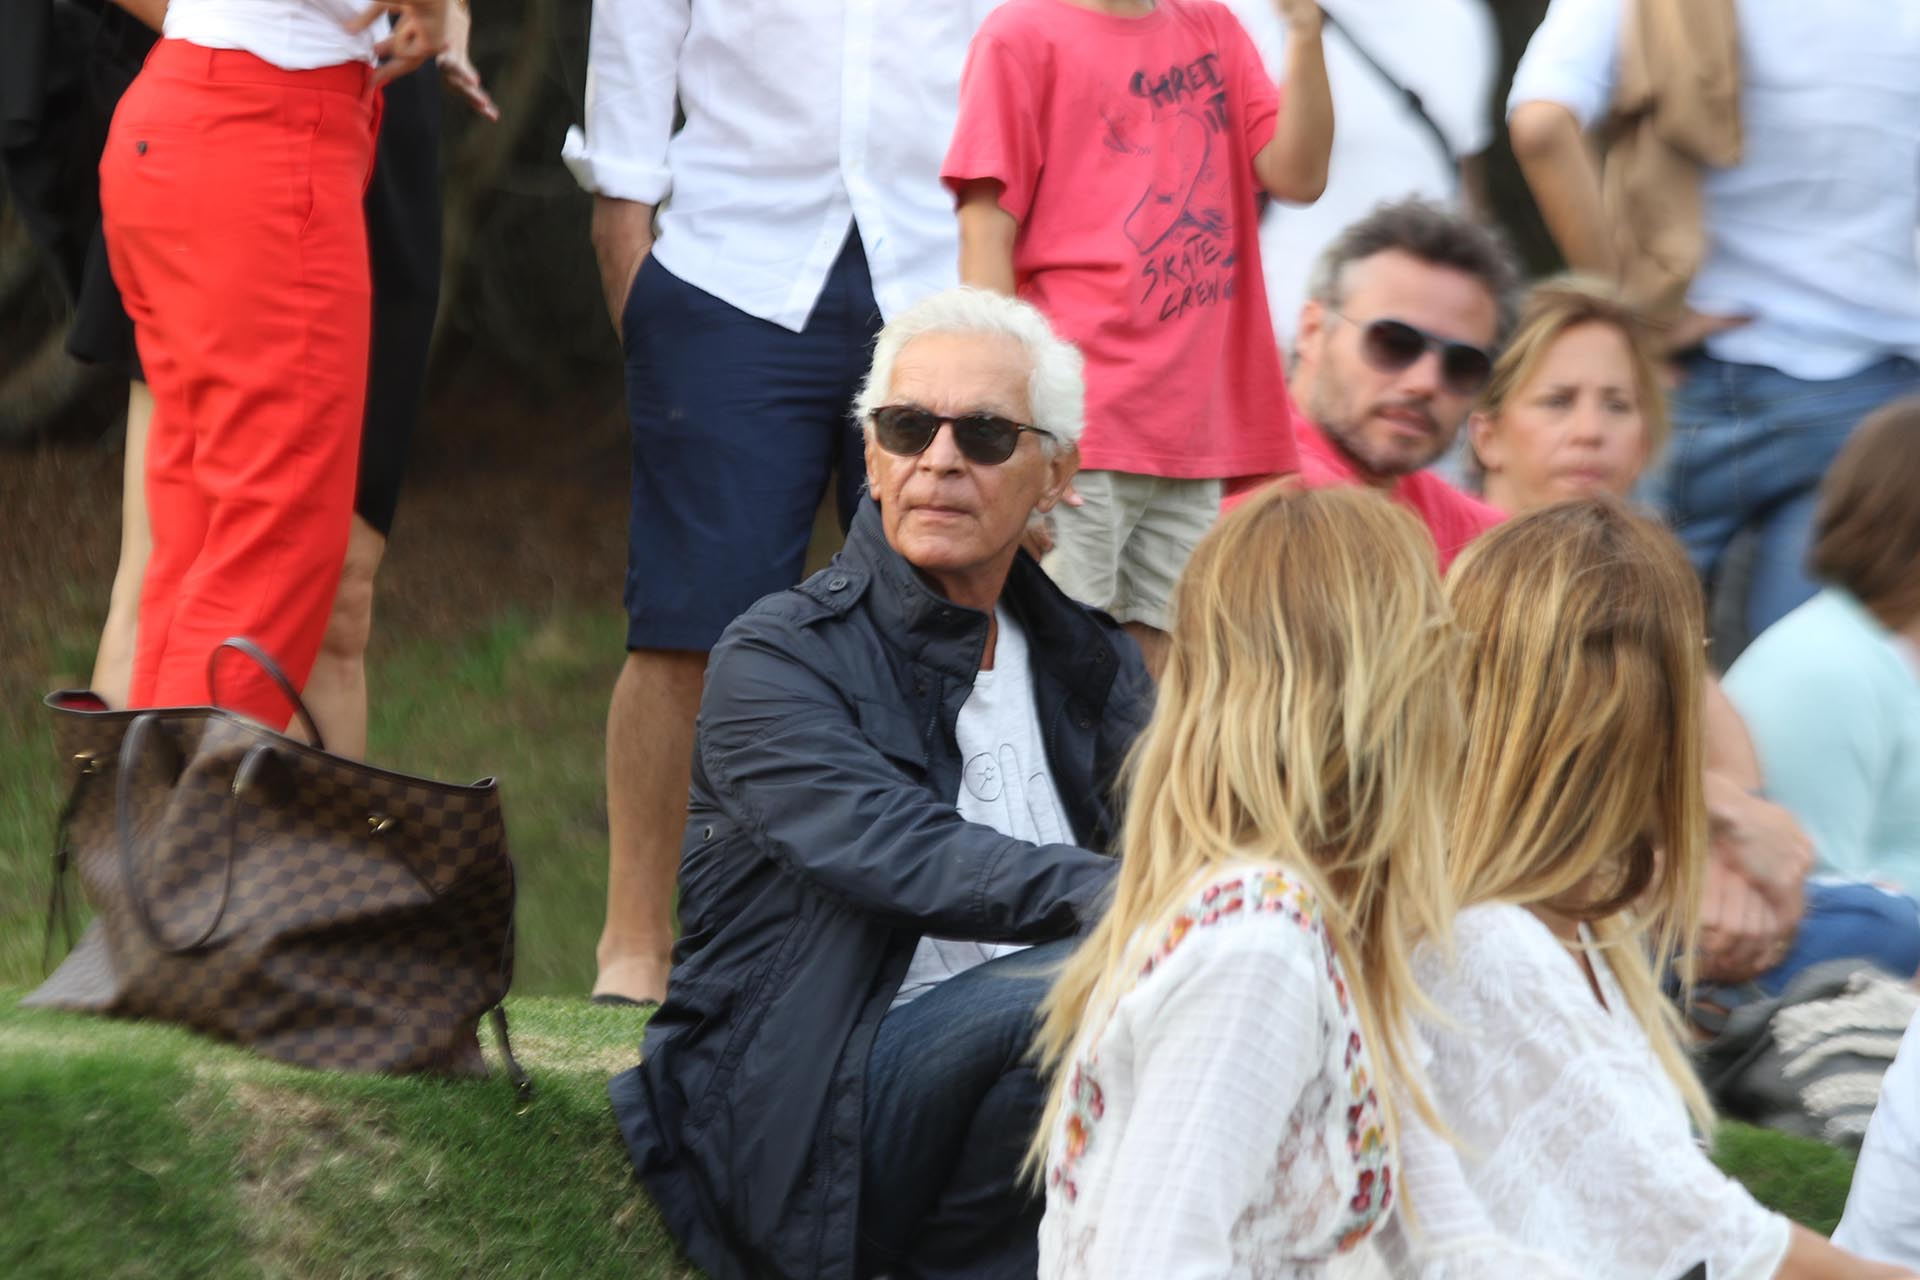 Eduardo Costantini mirando el partido